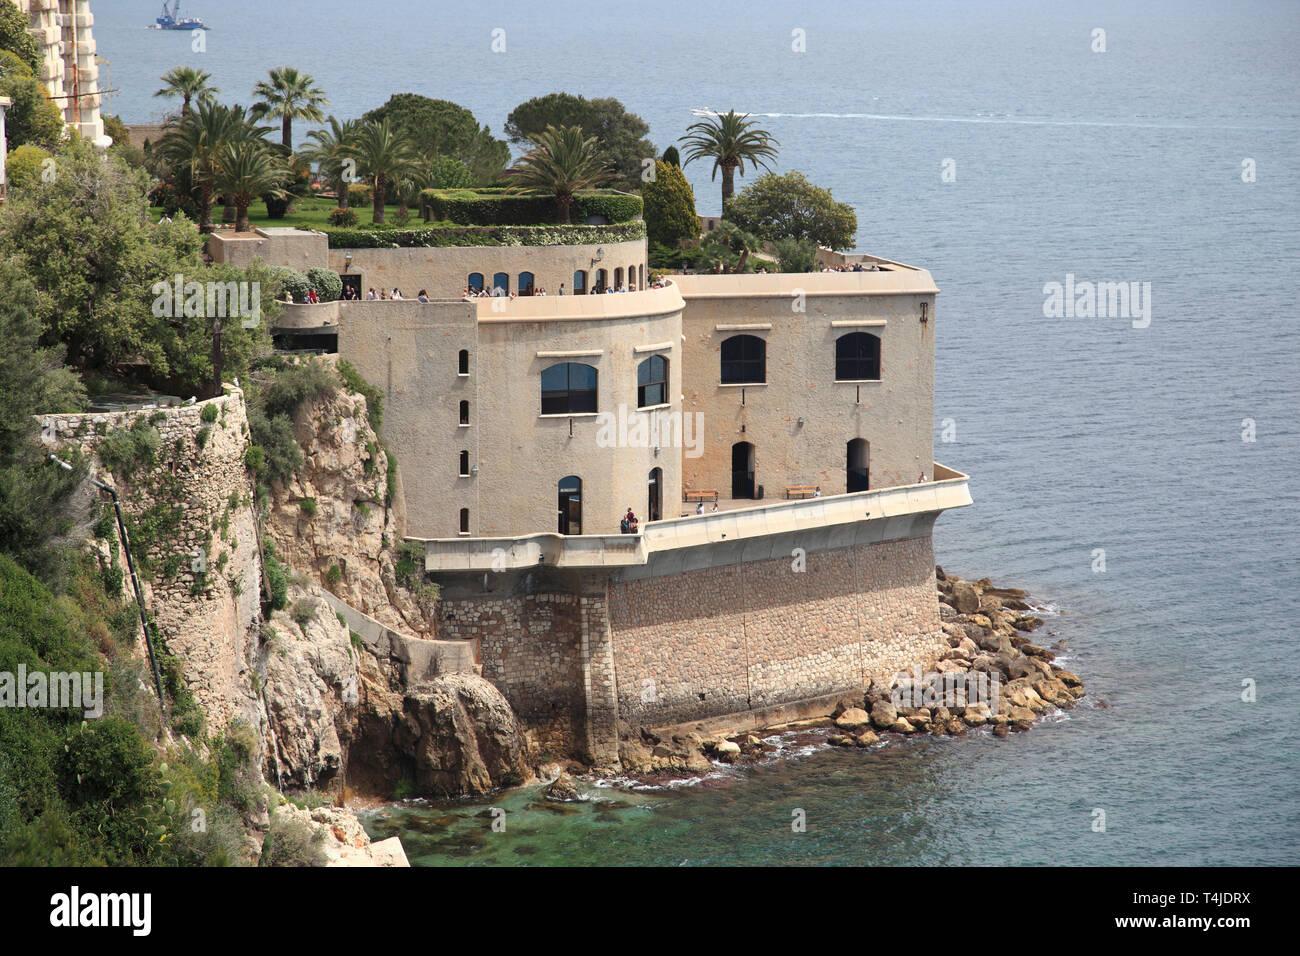 Oceanography Museum, Monaco-Ville, Monaco, Cote d Azur, Mediterranean, Europe - Stock Image